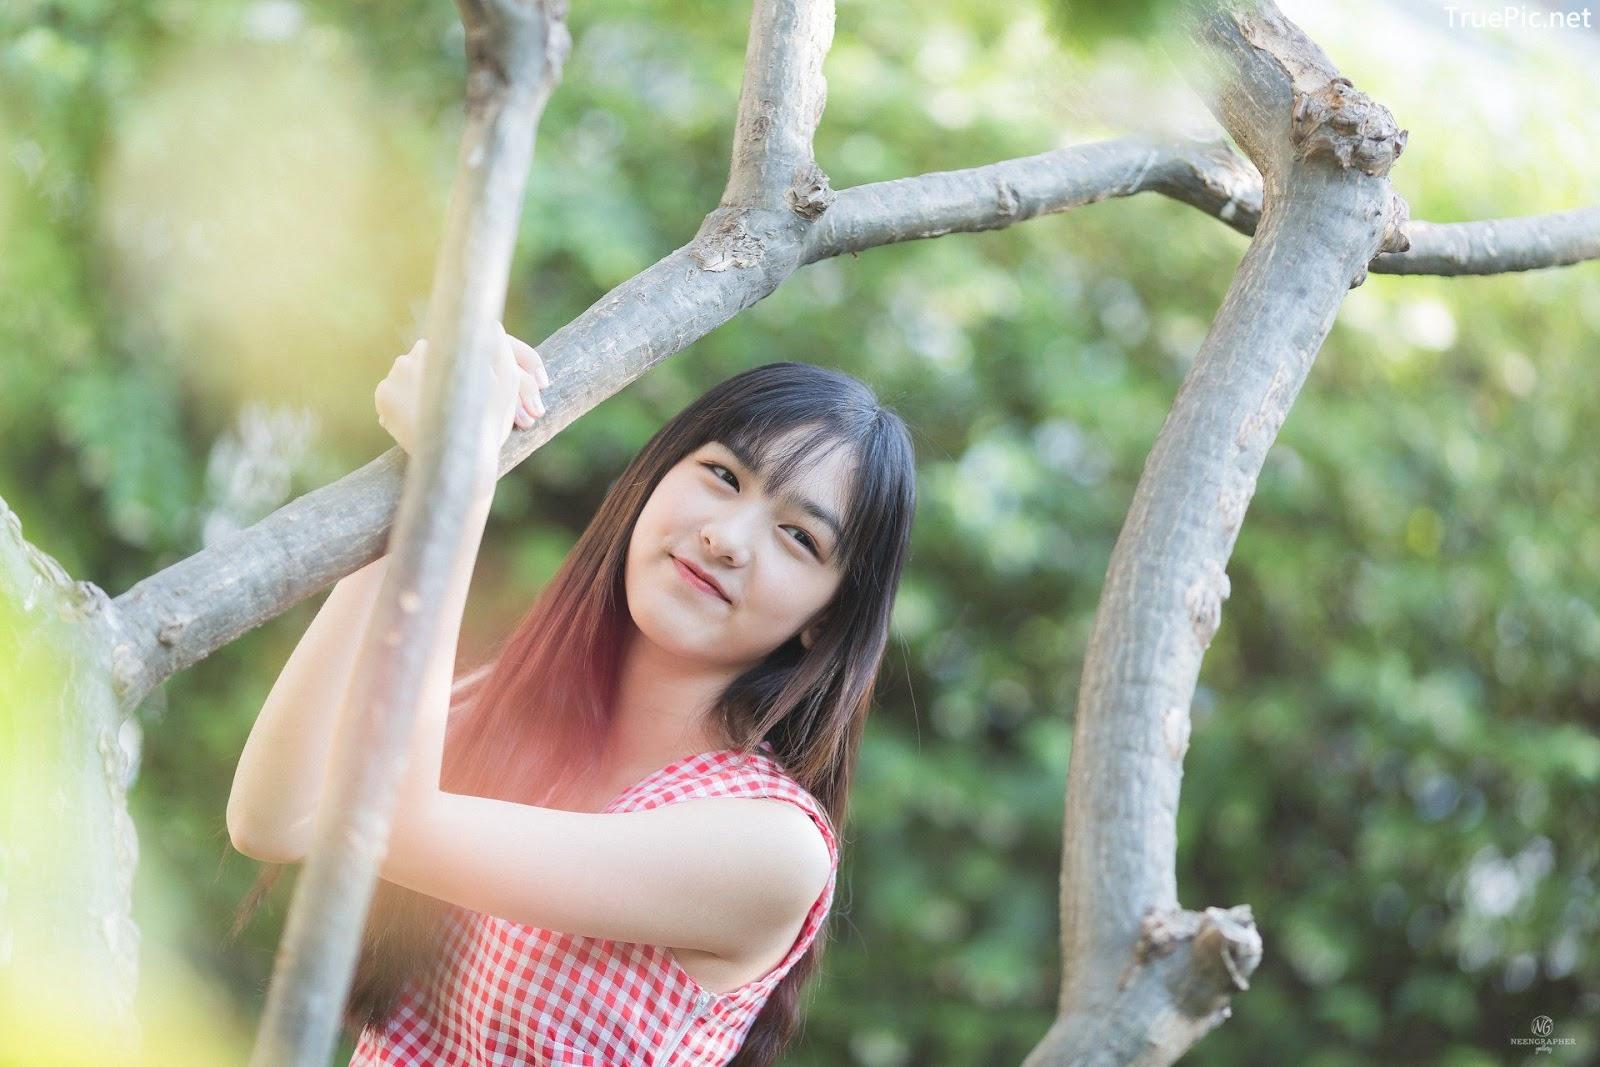 Image-Thailand-Cute-Model-Emma-Panisara–Album-Emma-Bright-Sunday-TruePic.net- Picture-17